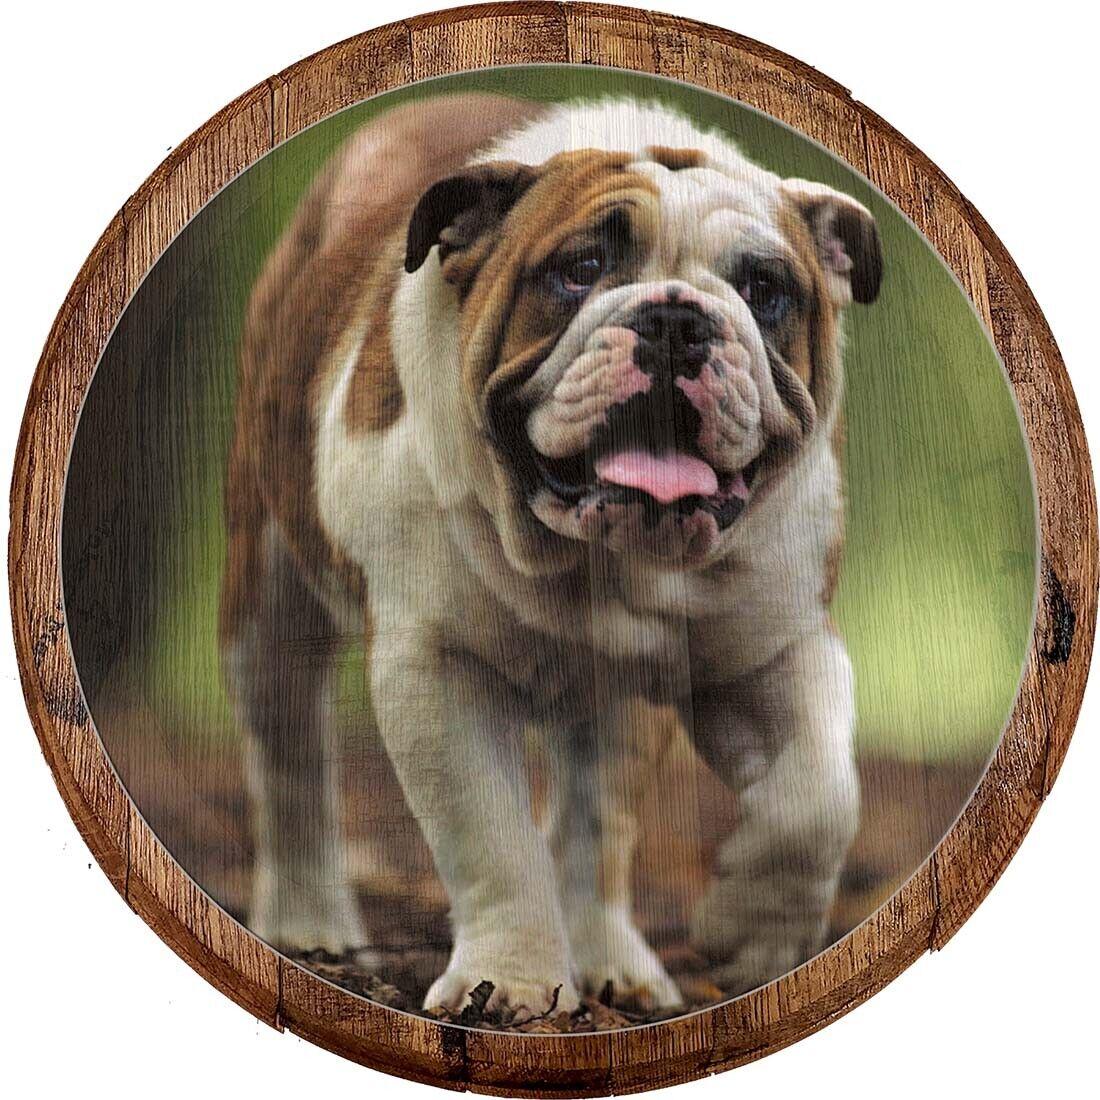 Whiskey Barrel Head Happy English Bulldog Dog Furbaby K9 Animal Décor Wall Art